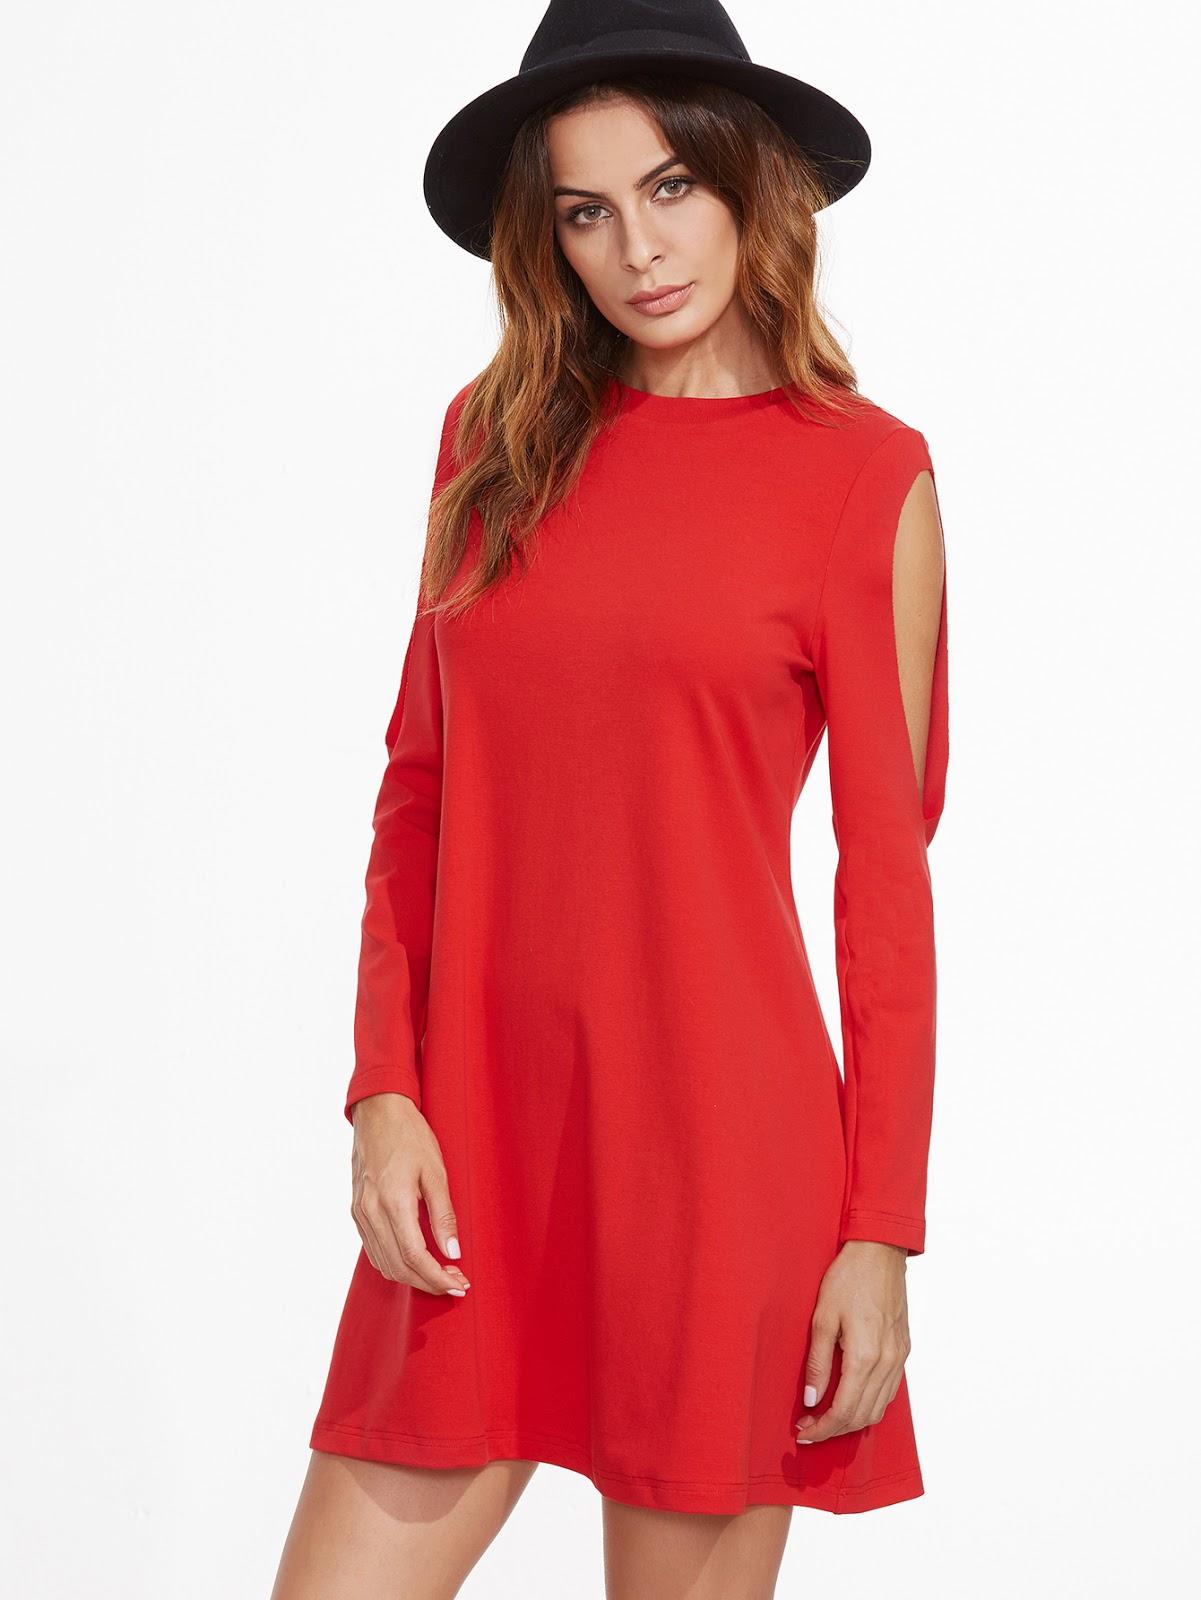 c3d547cb1 50 Vestidos Rojos ¡Ideas Perfectas para Ti!